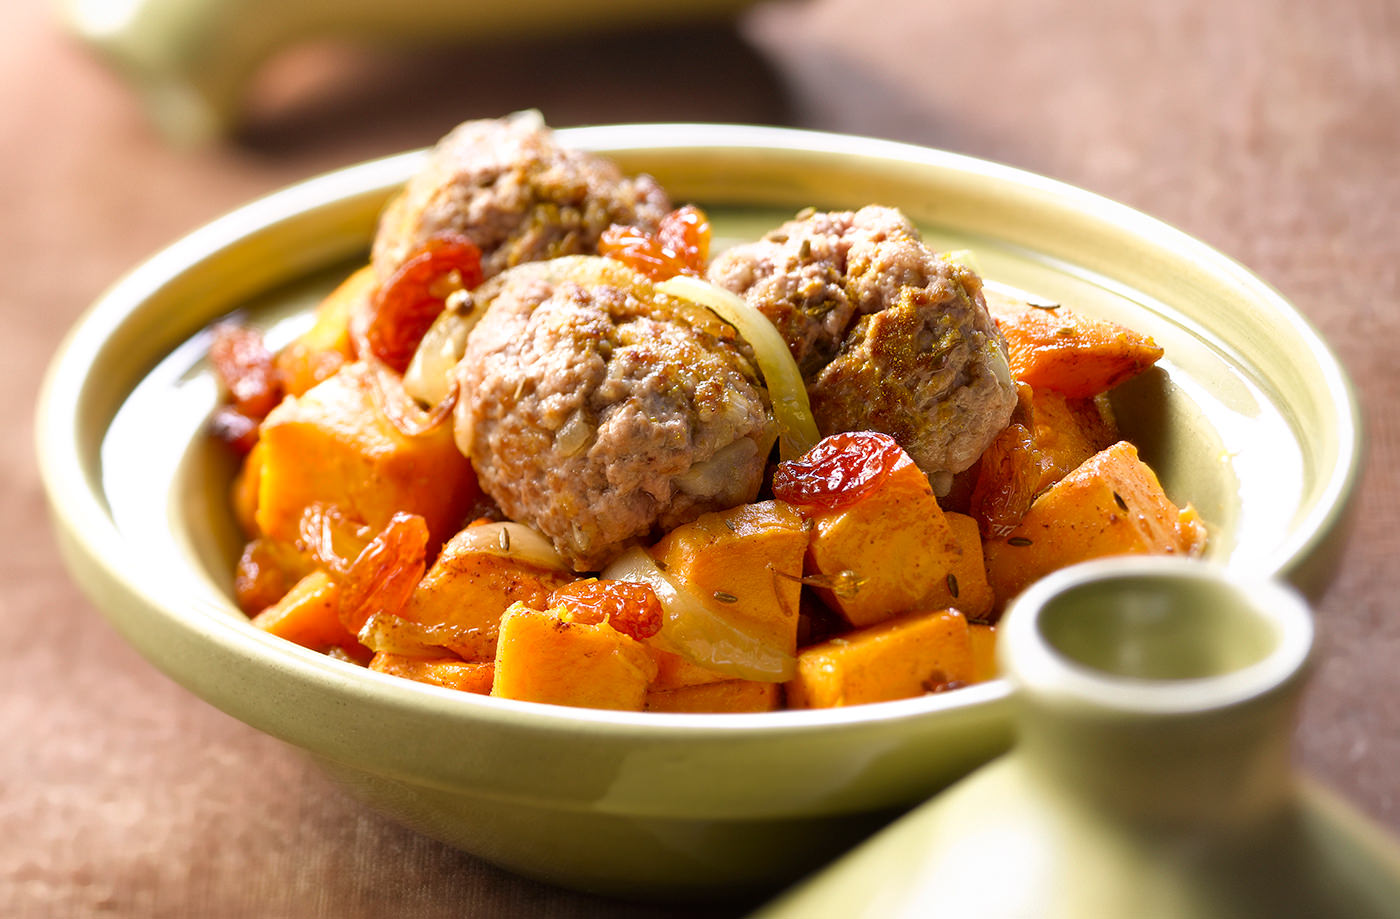 Lamb-meatball-tagine-LGH-mini-e8669a6e-831a-408c-b54a-04ac57ca1150-0-1400x919.jpg